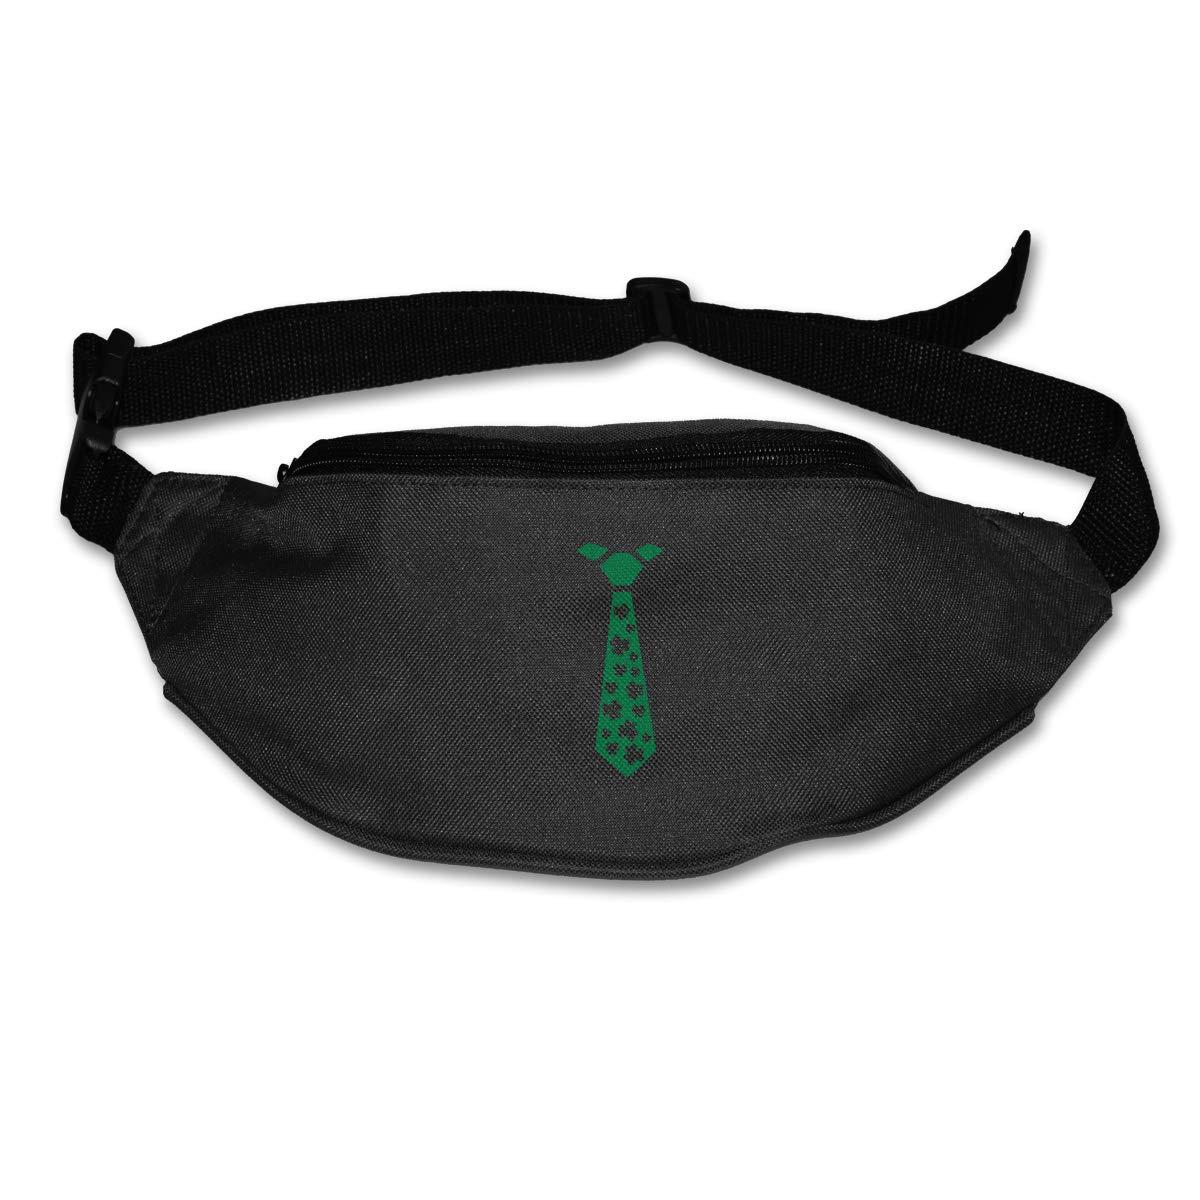 Shamrocks Tie Sport Waist Packs Fanny Pack Adjustable For Run